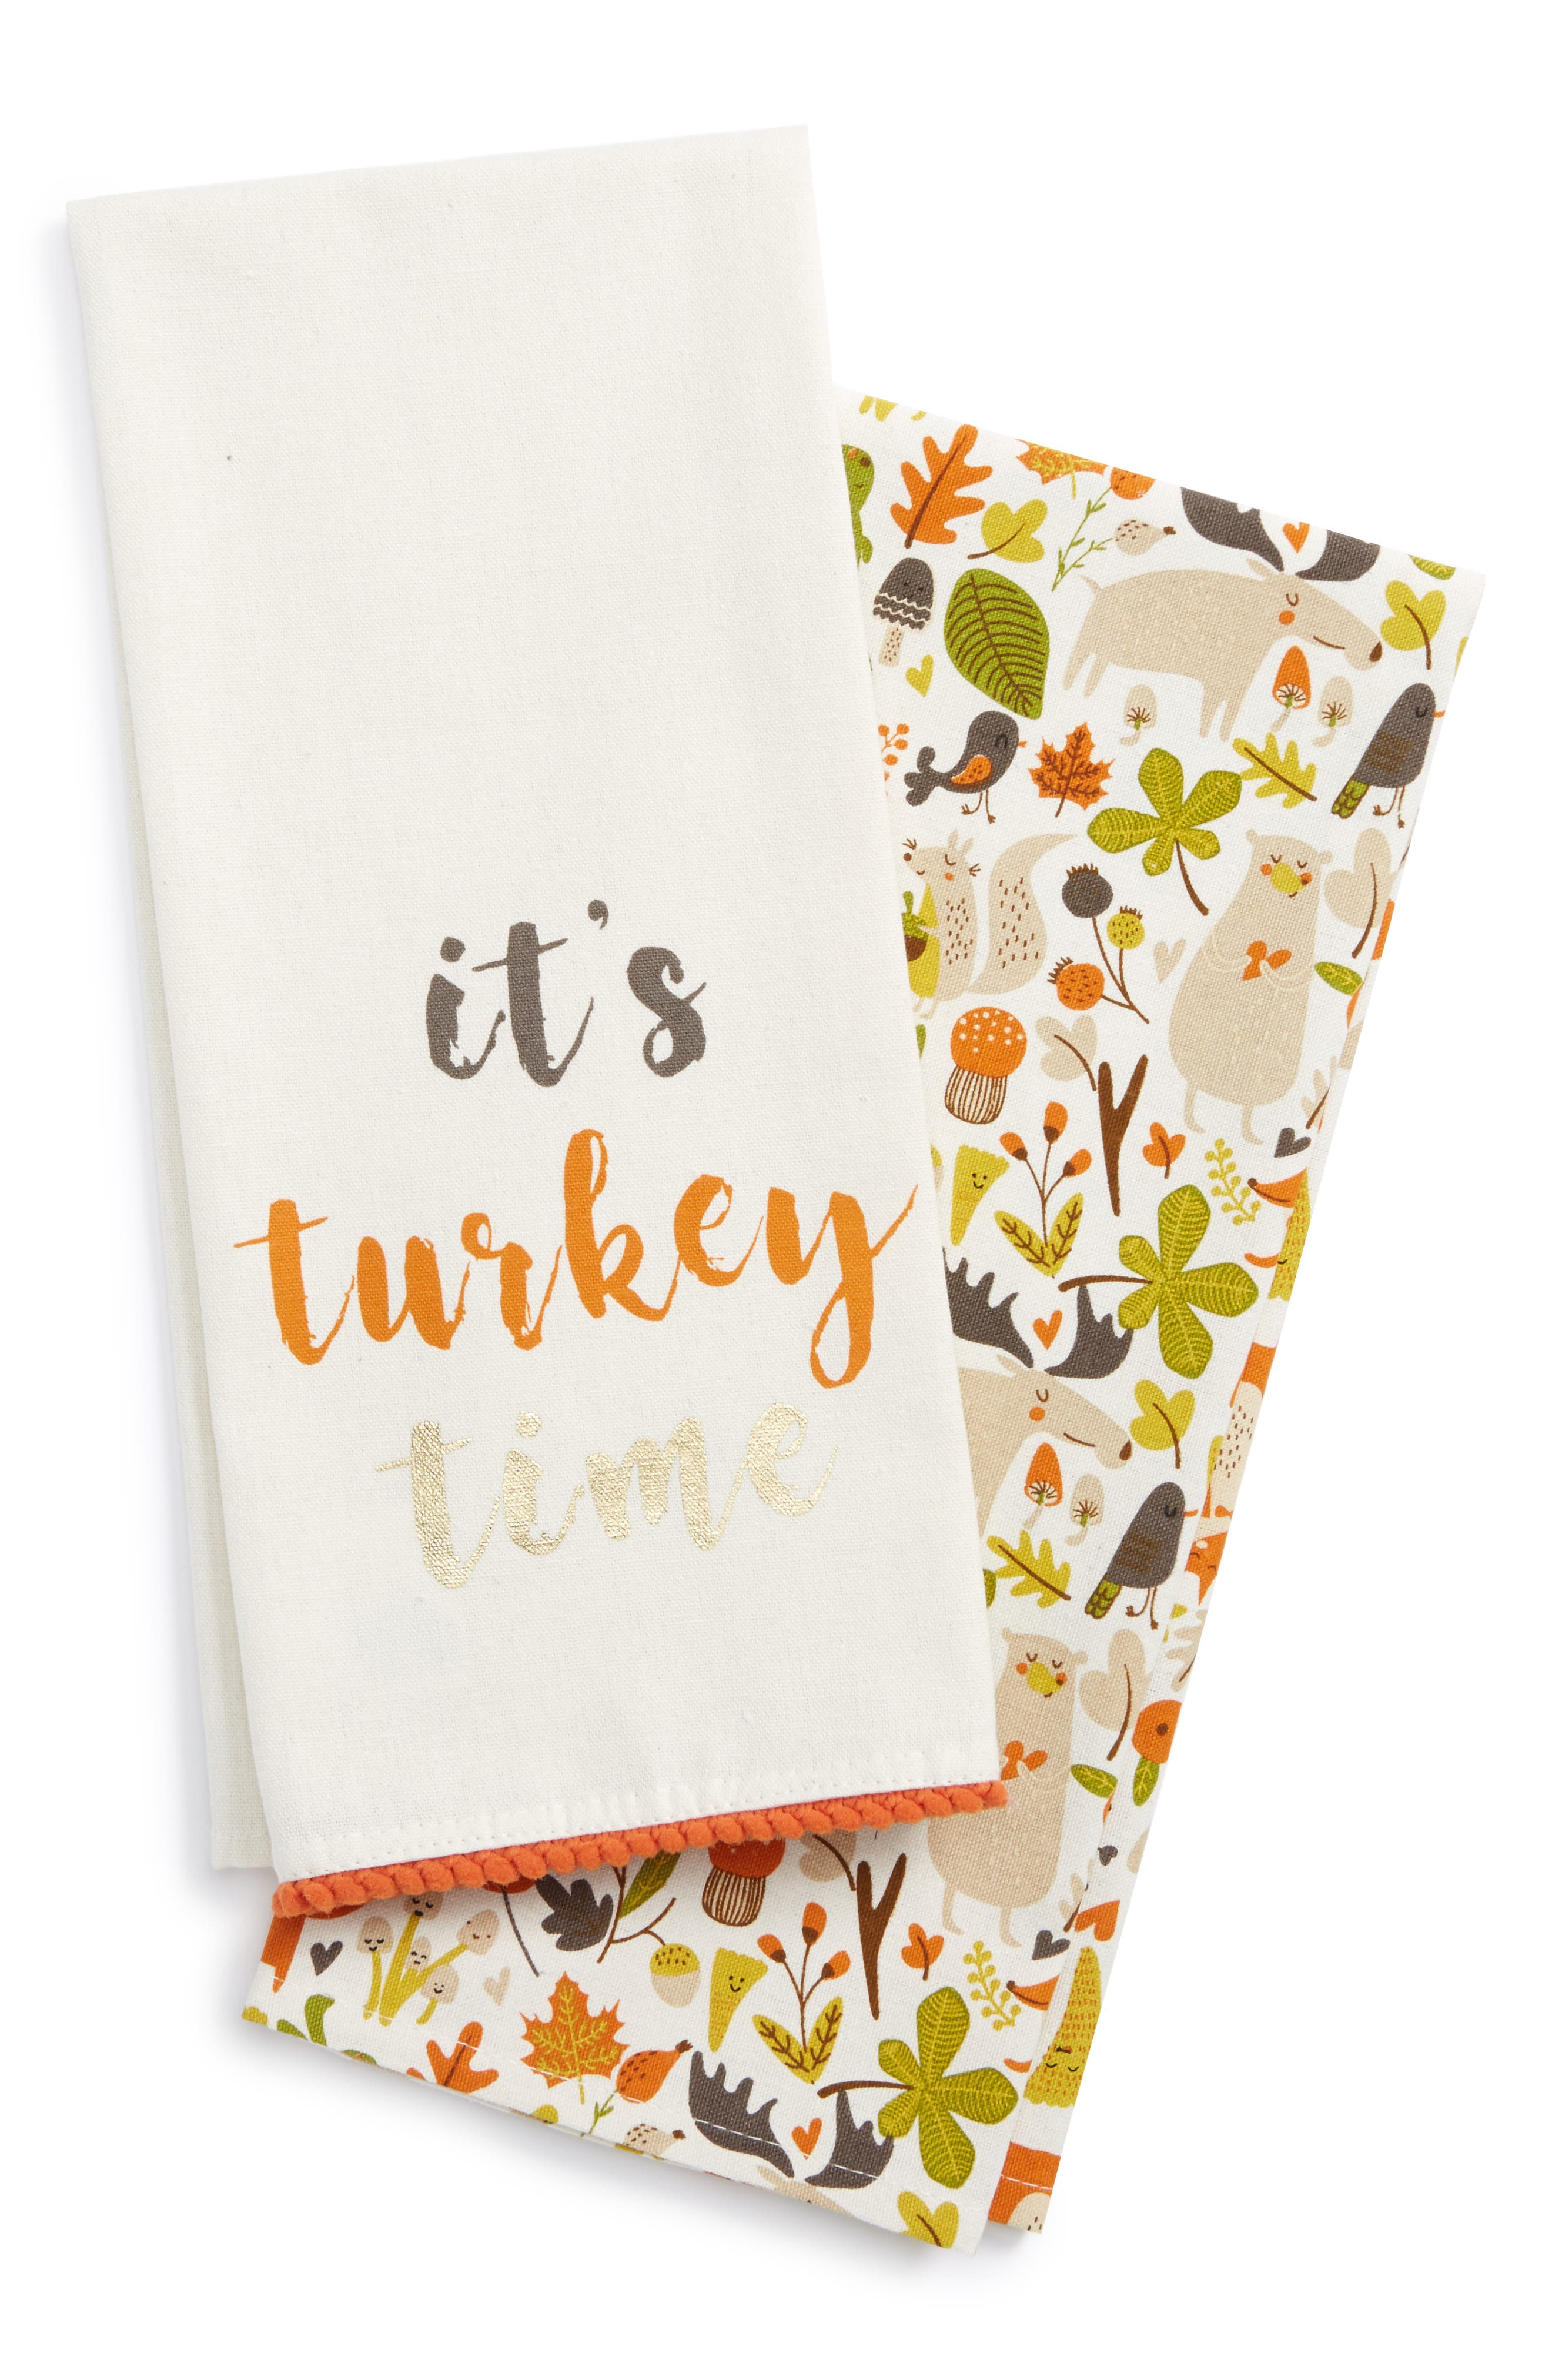 Turkey Time Set of 2 Dish Towels,                             Main thumbnail 1, color,                             250